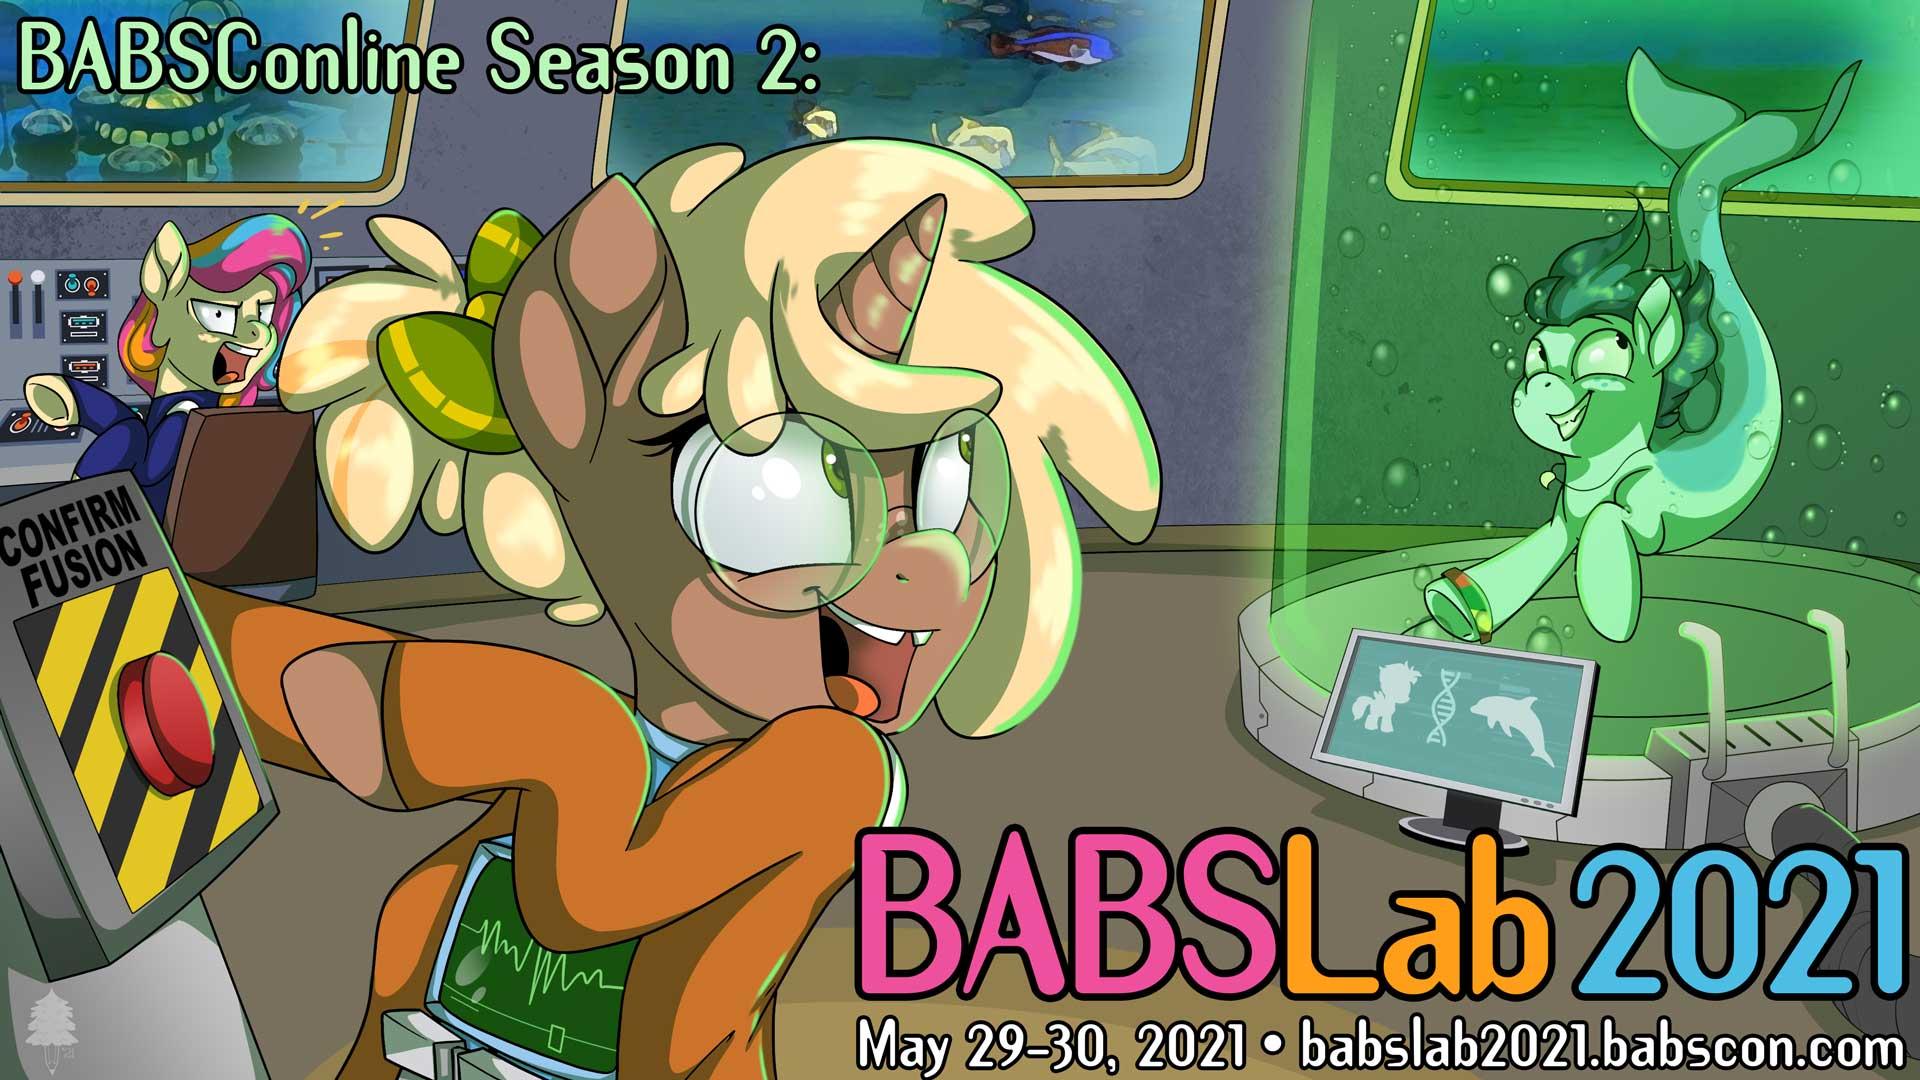 Announcing BABSConline Season 2: BABSLab 2021, May 29–30!